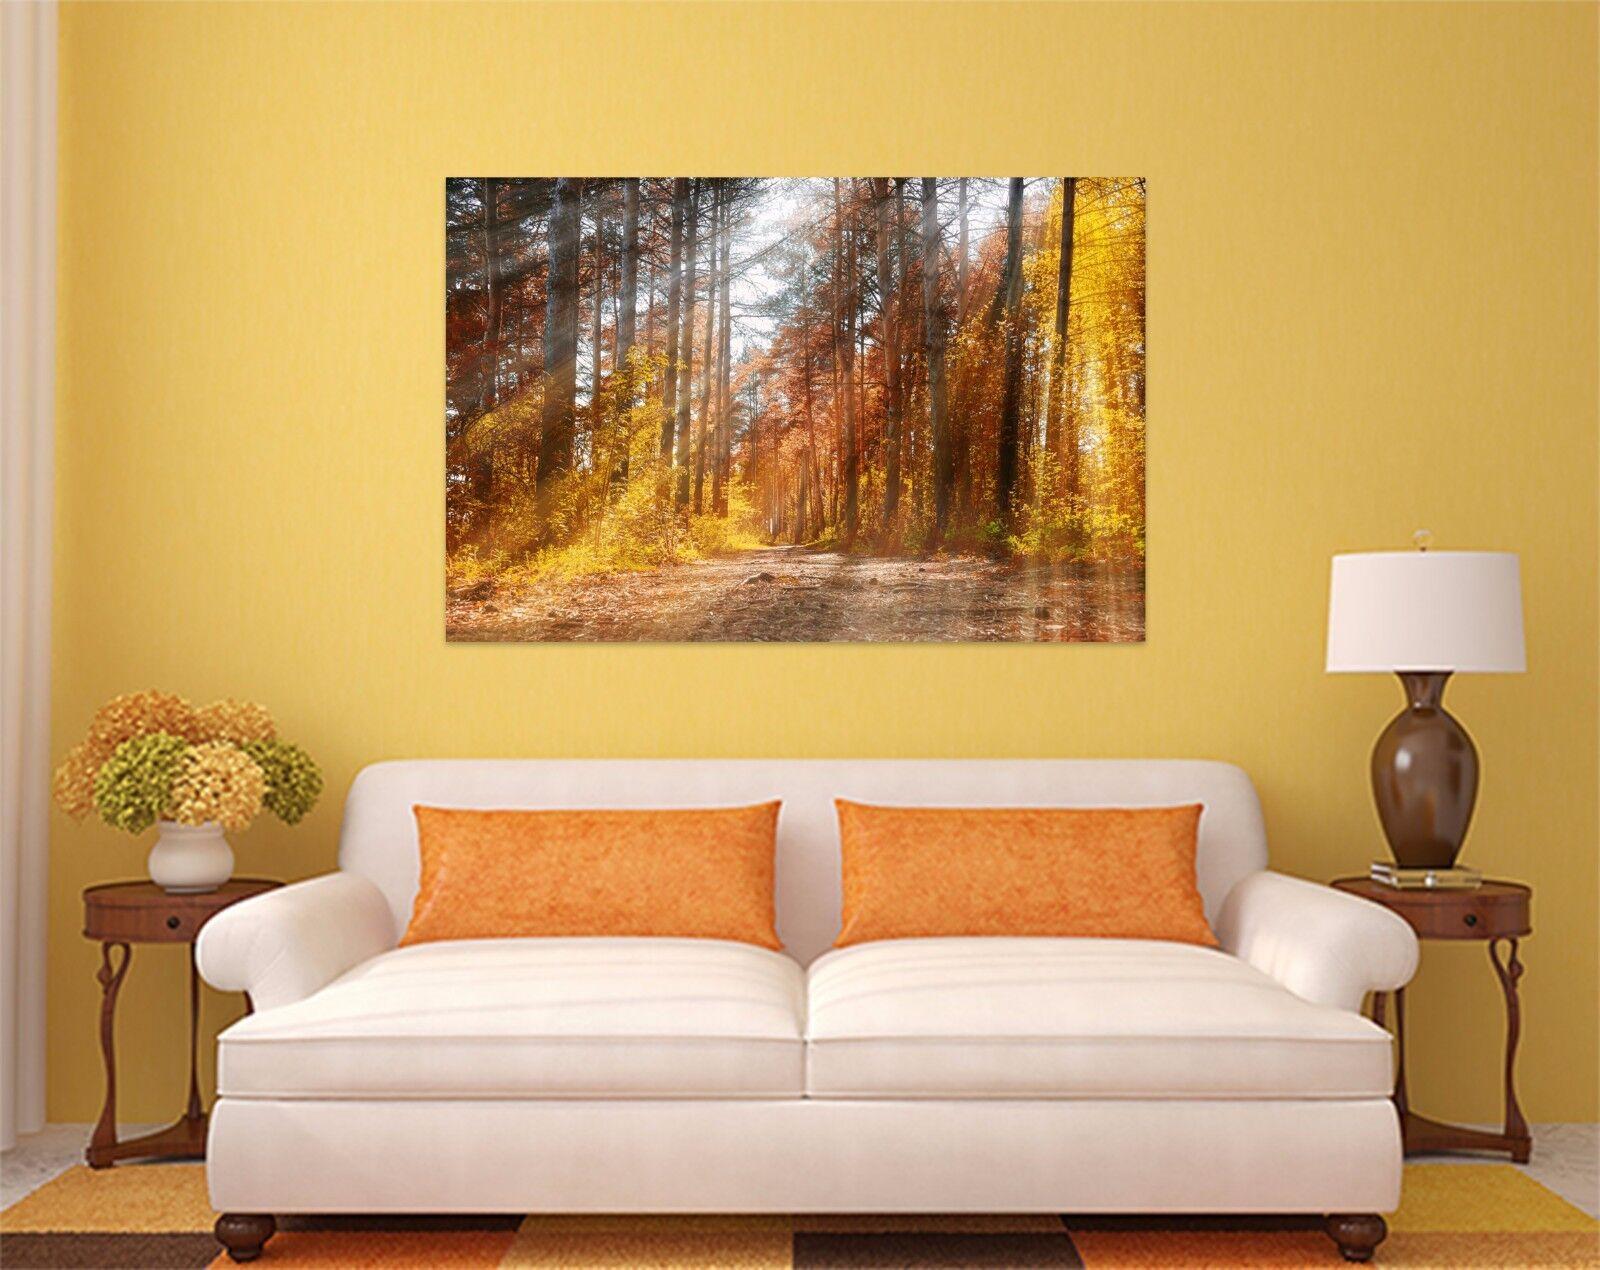 3D Goldener Sträucher Wald 786 Fototapeten Wandbild BildTapete AJSTORE DE Lemon